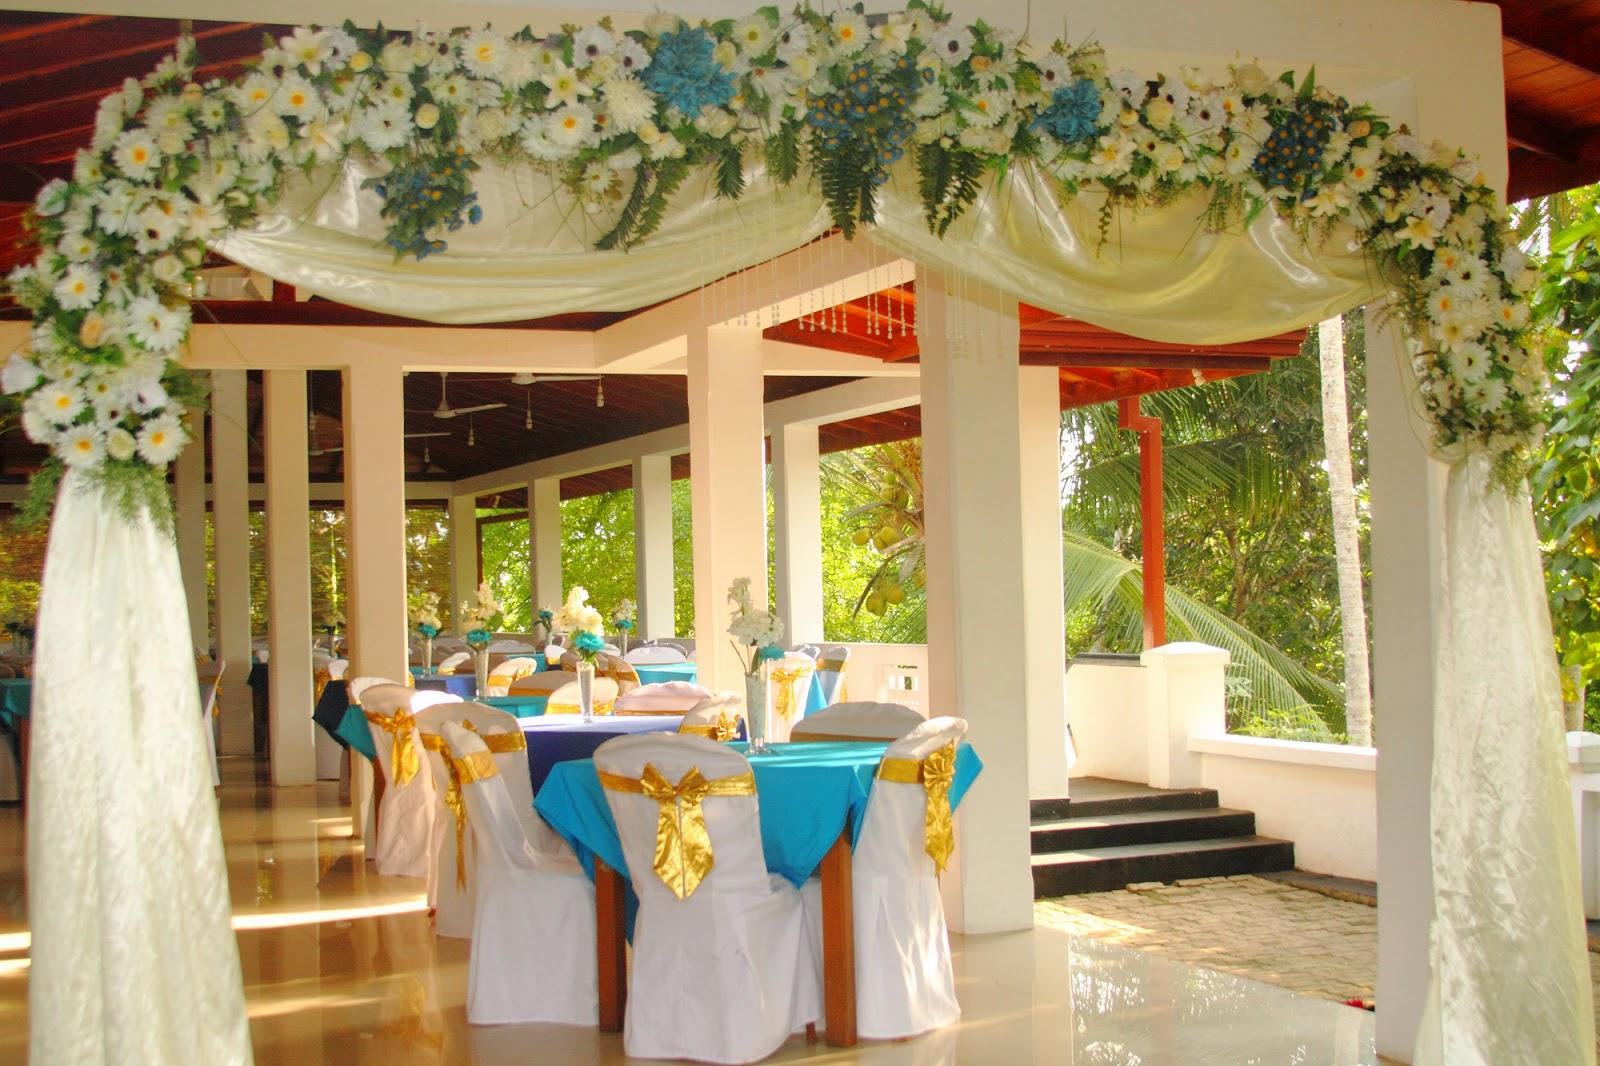 Hillol and nowshin wedding